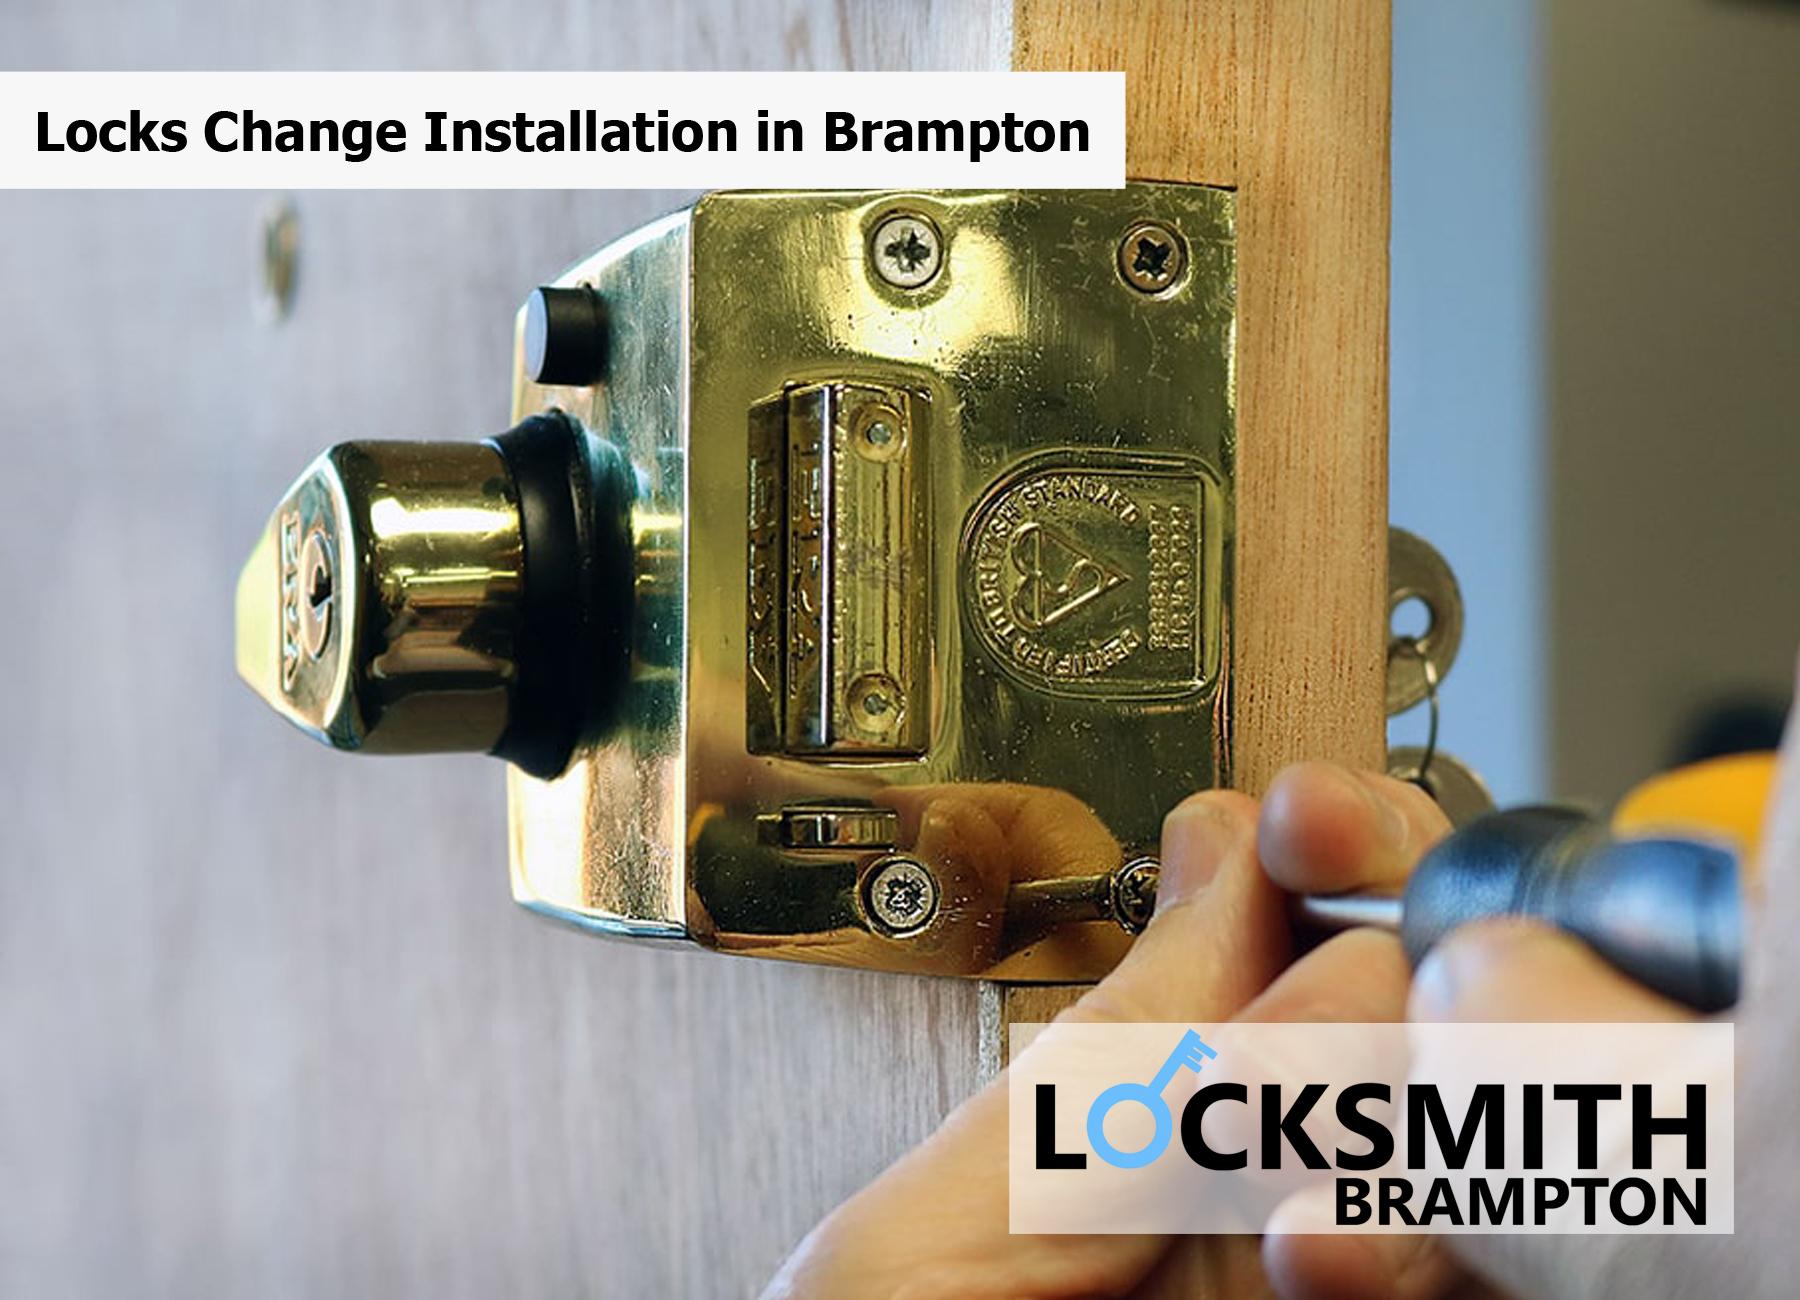 Locks Change Installation in Brampton